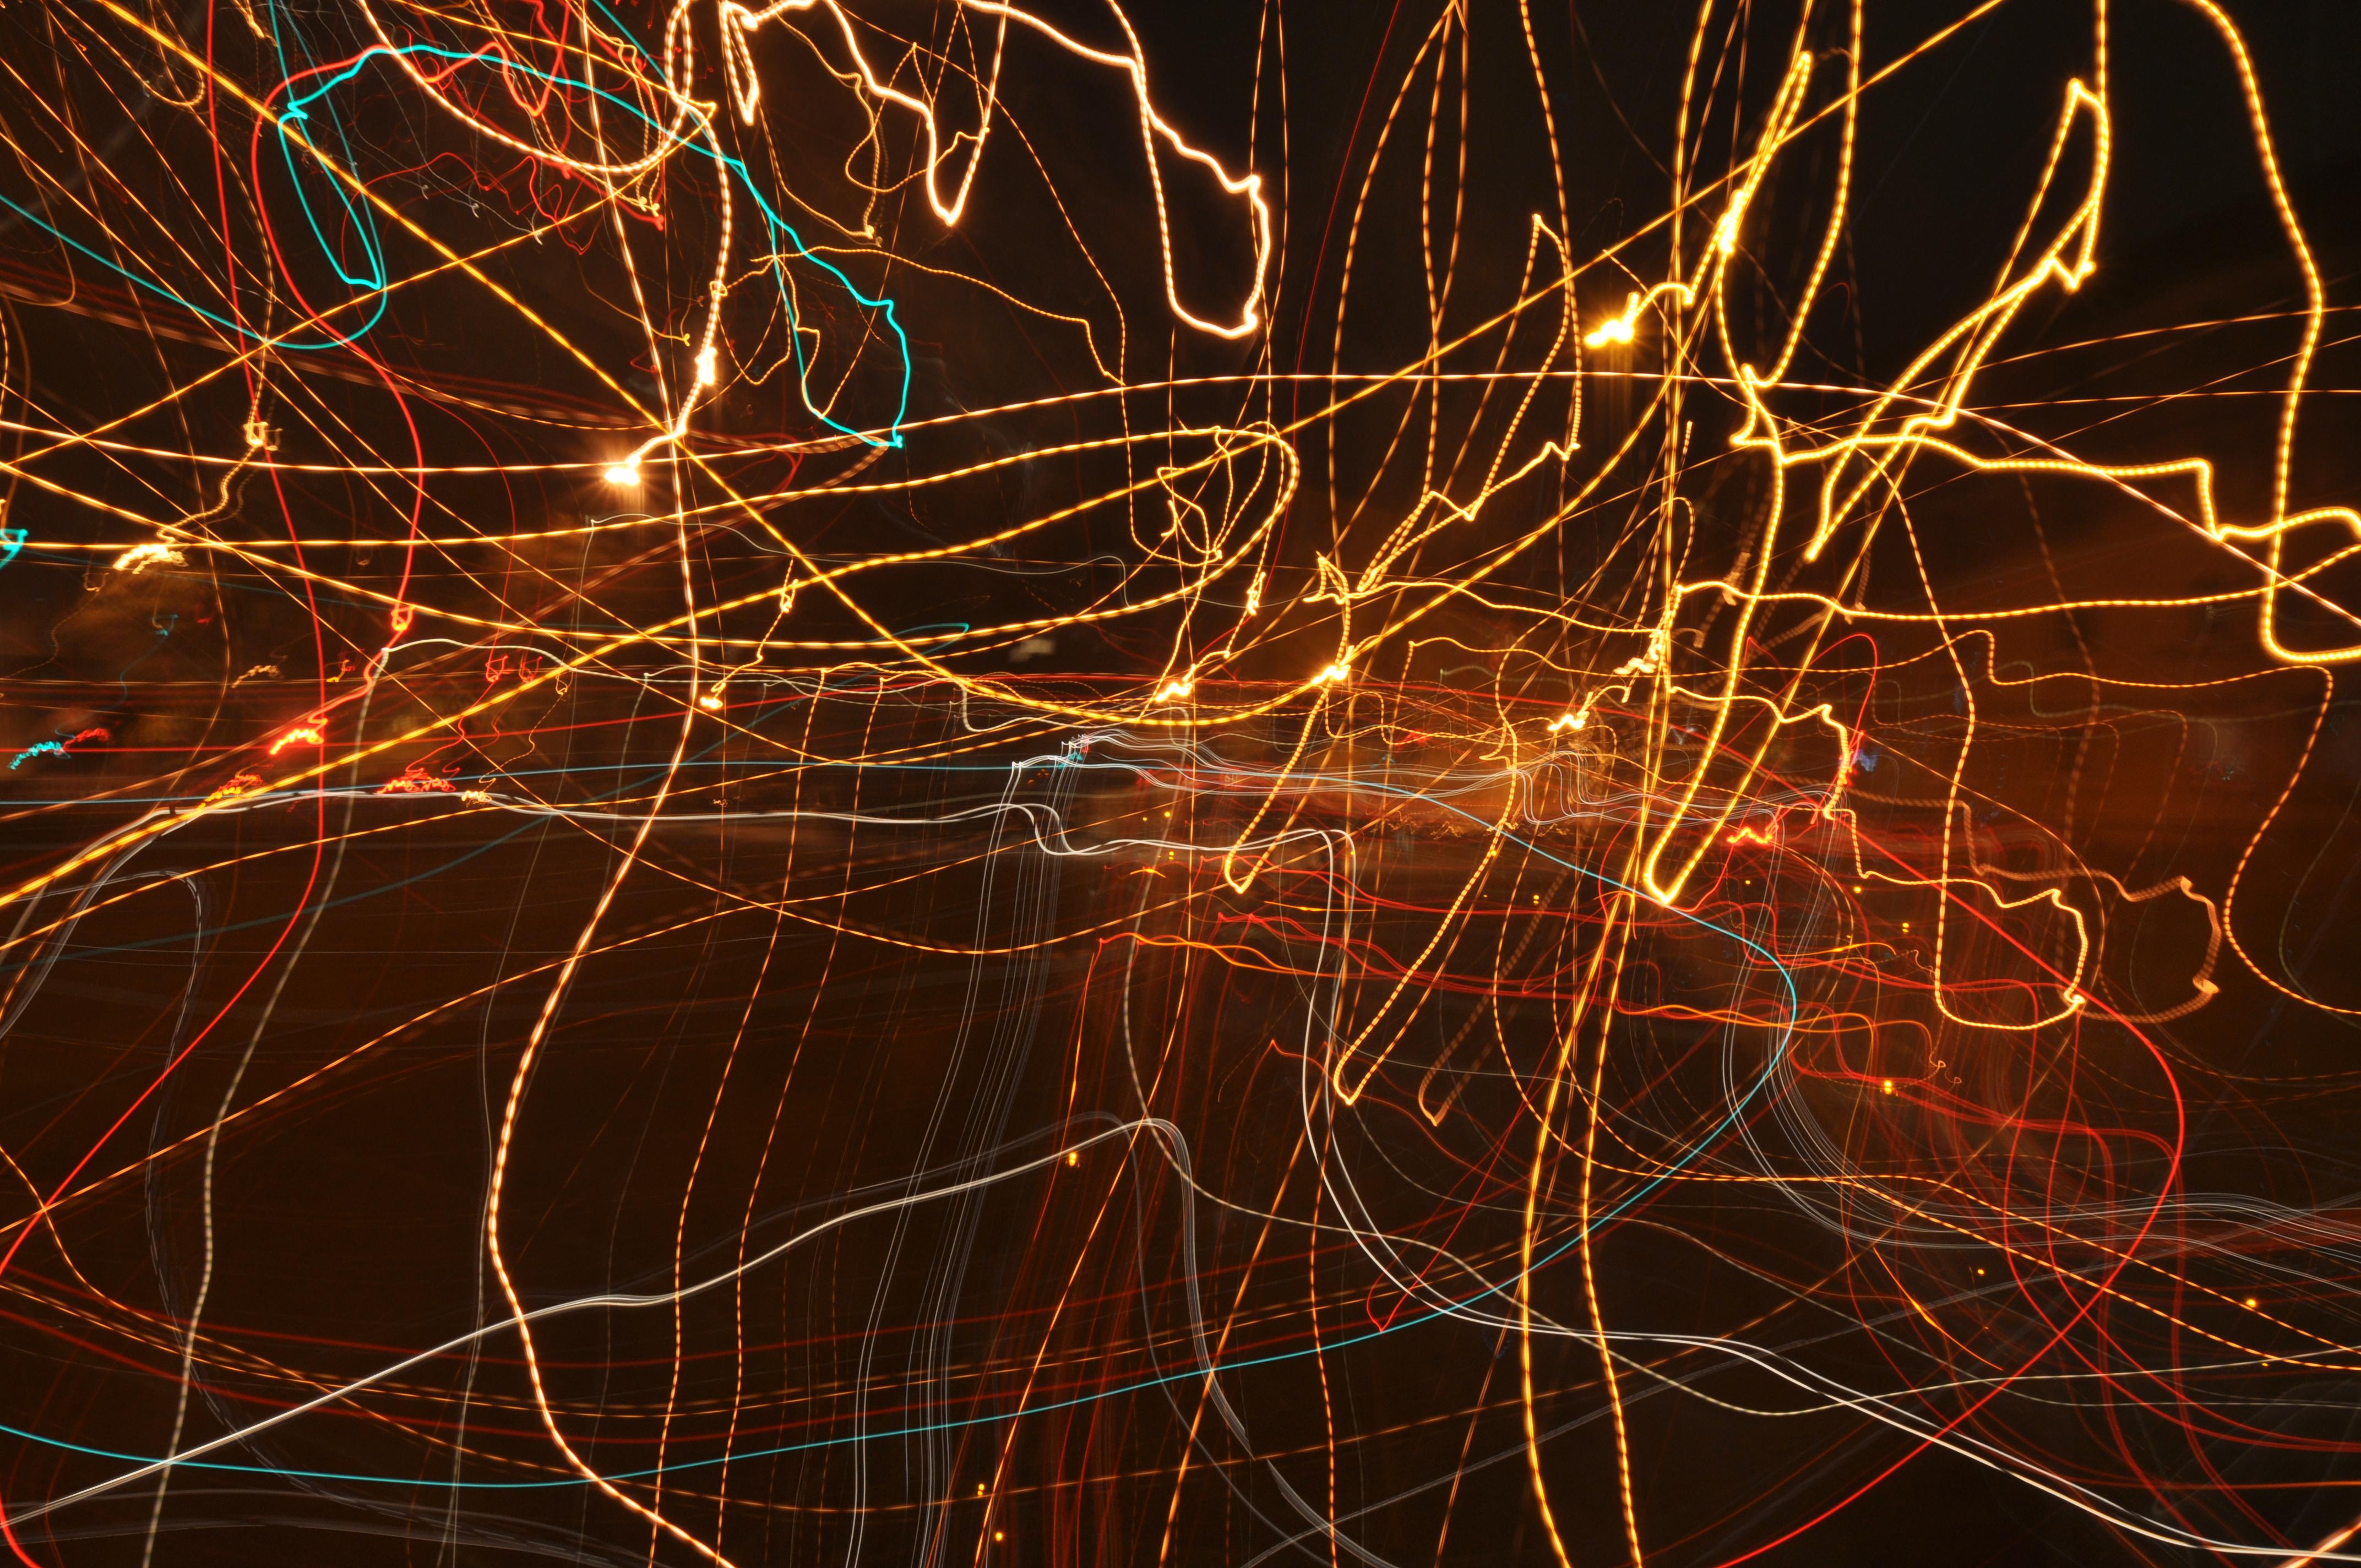 Abstract Traffic Lights Cc0 Photo